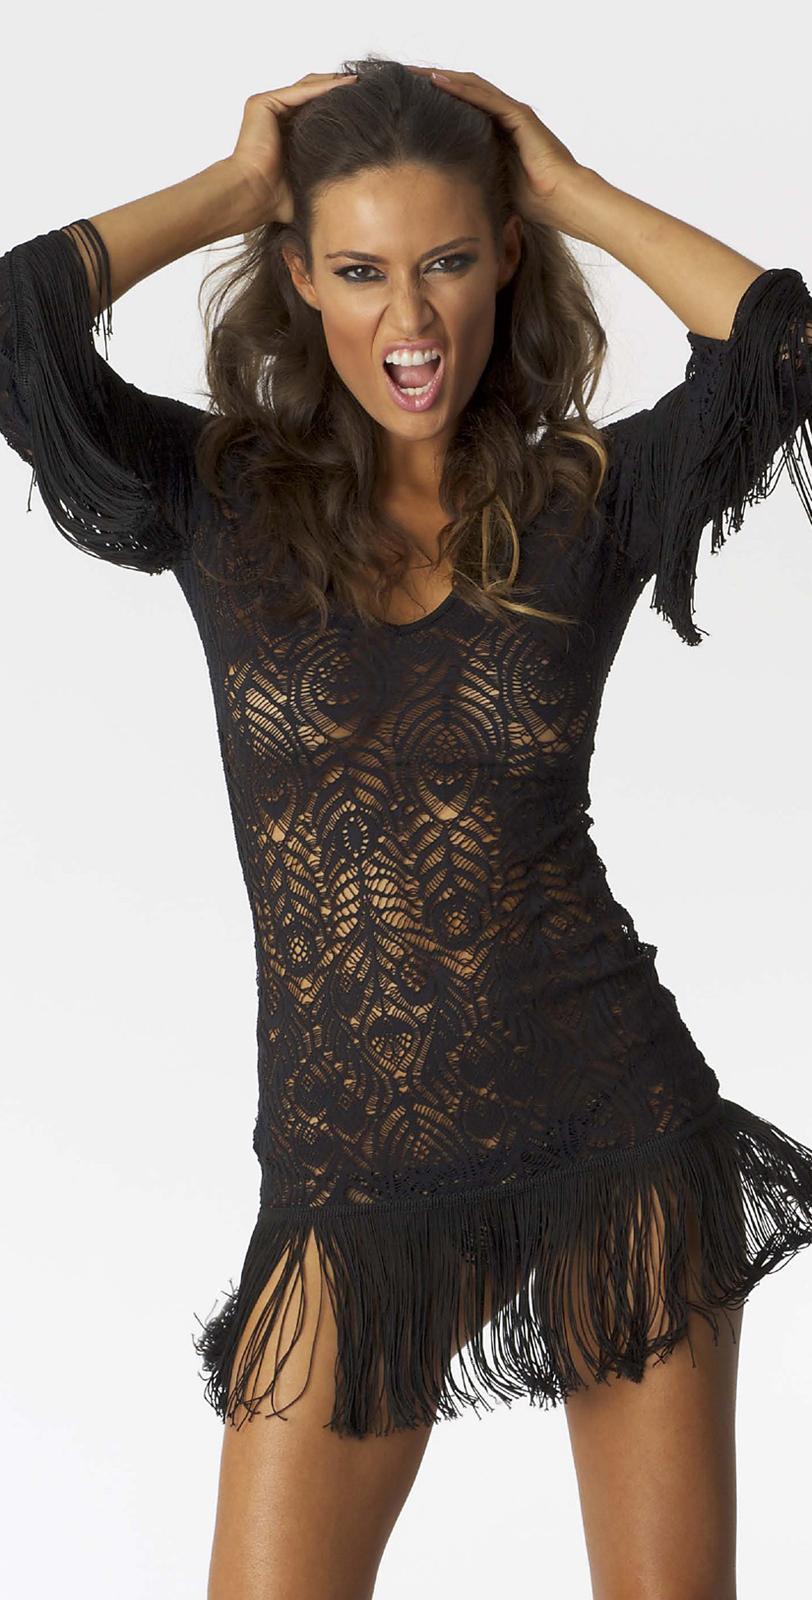 fringe bikini cover up dressesInca 2013 Crochet Fringe Dress Available in Black or Cream South wUMRNHMB